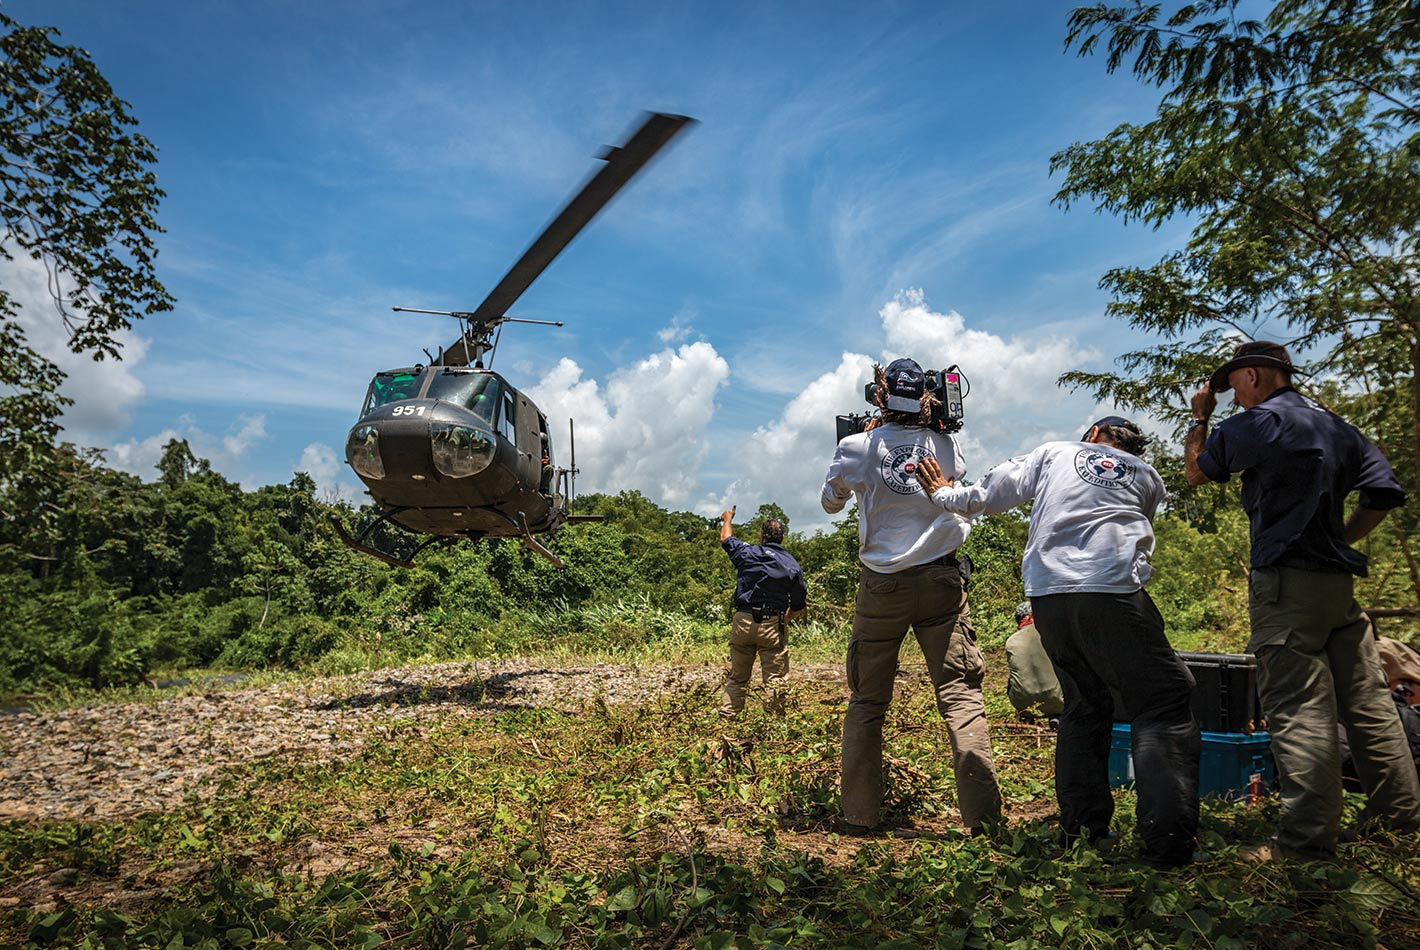 Atterrissage dans la Mosquitia honduras valentin pacaut